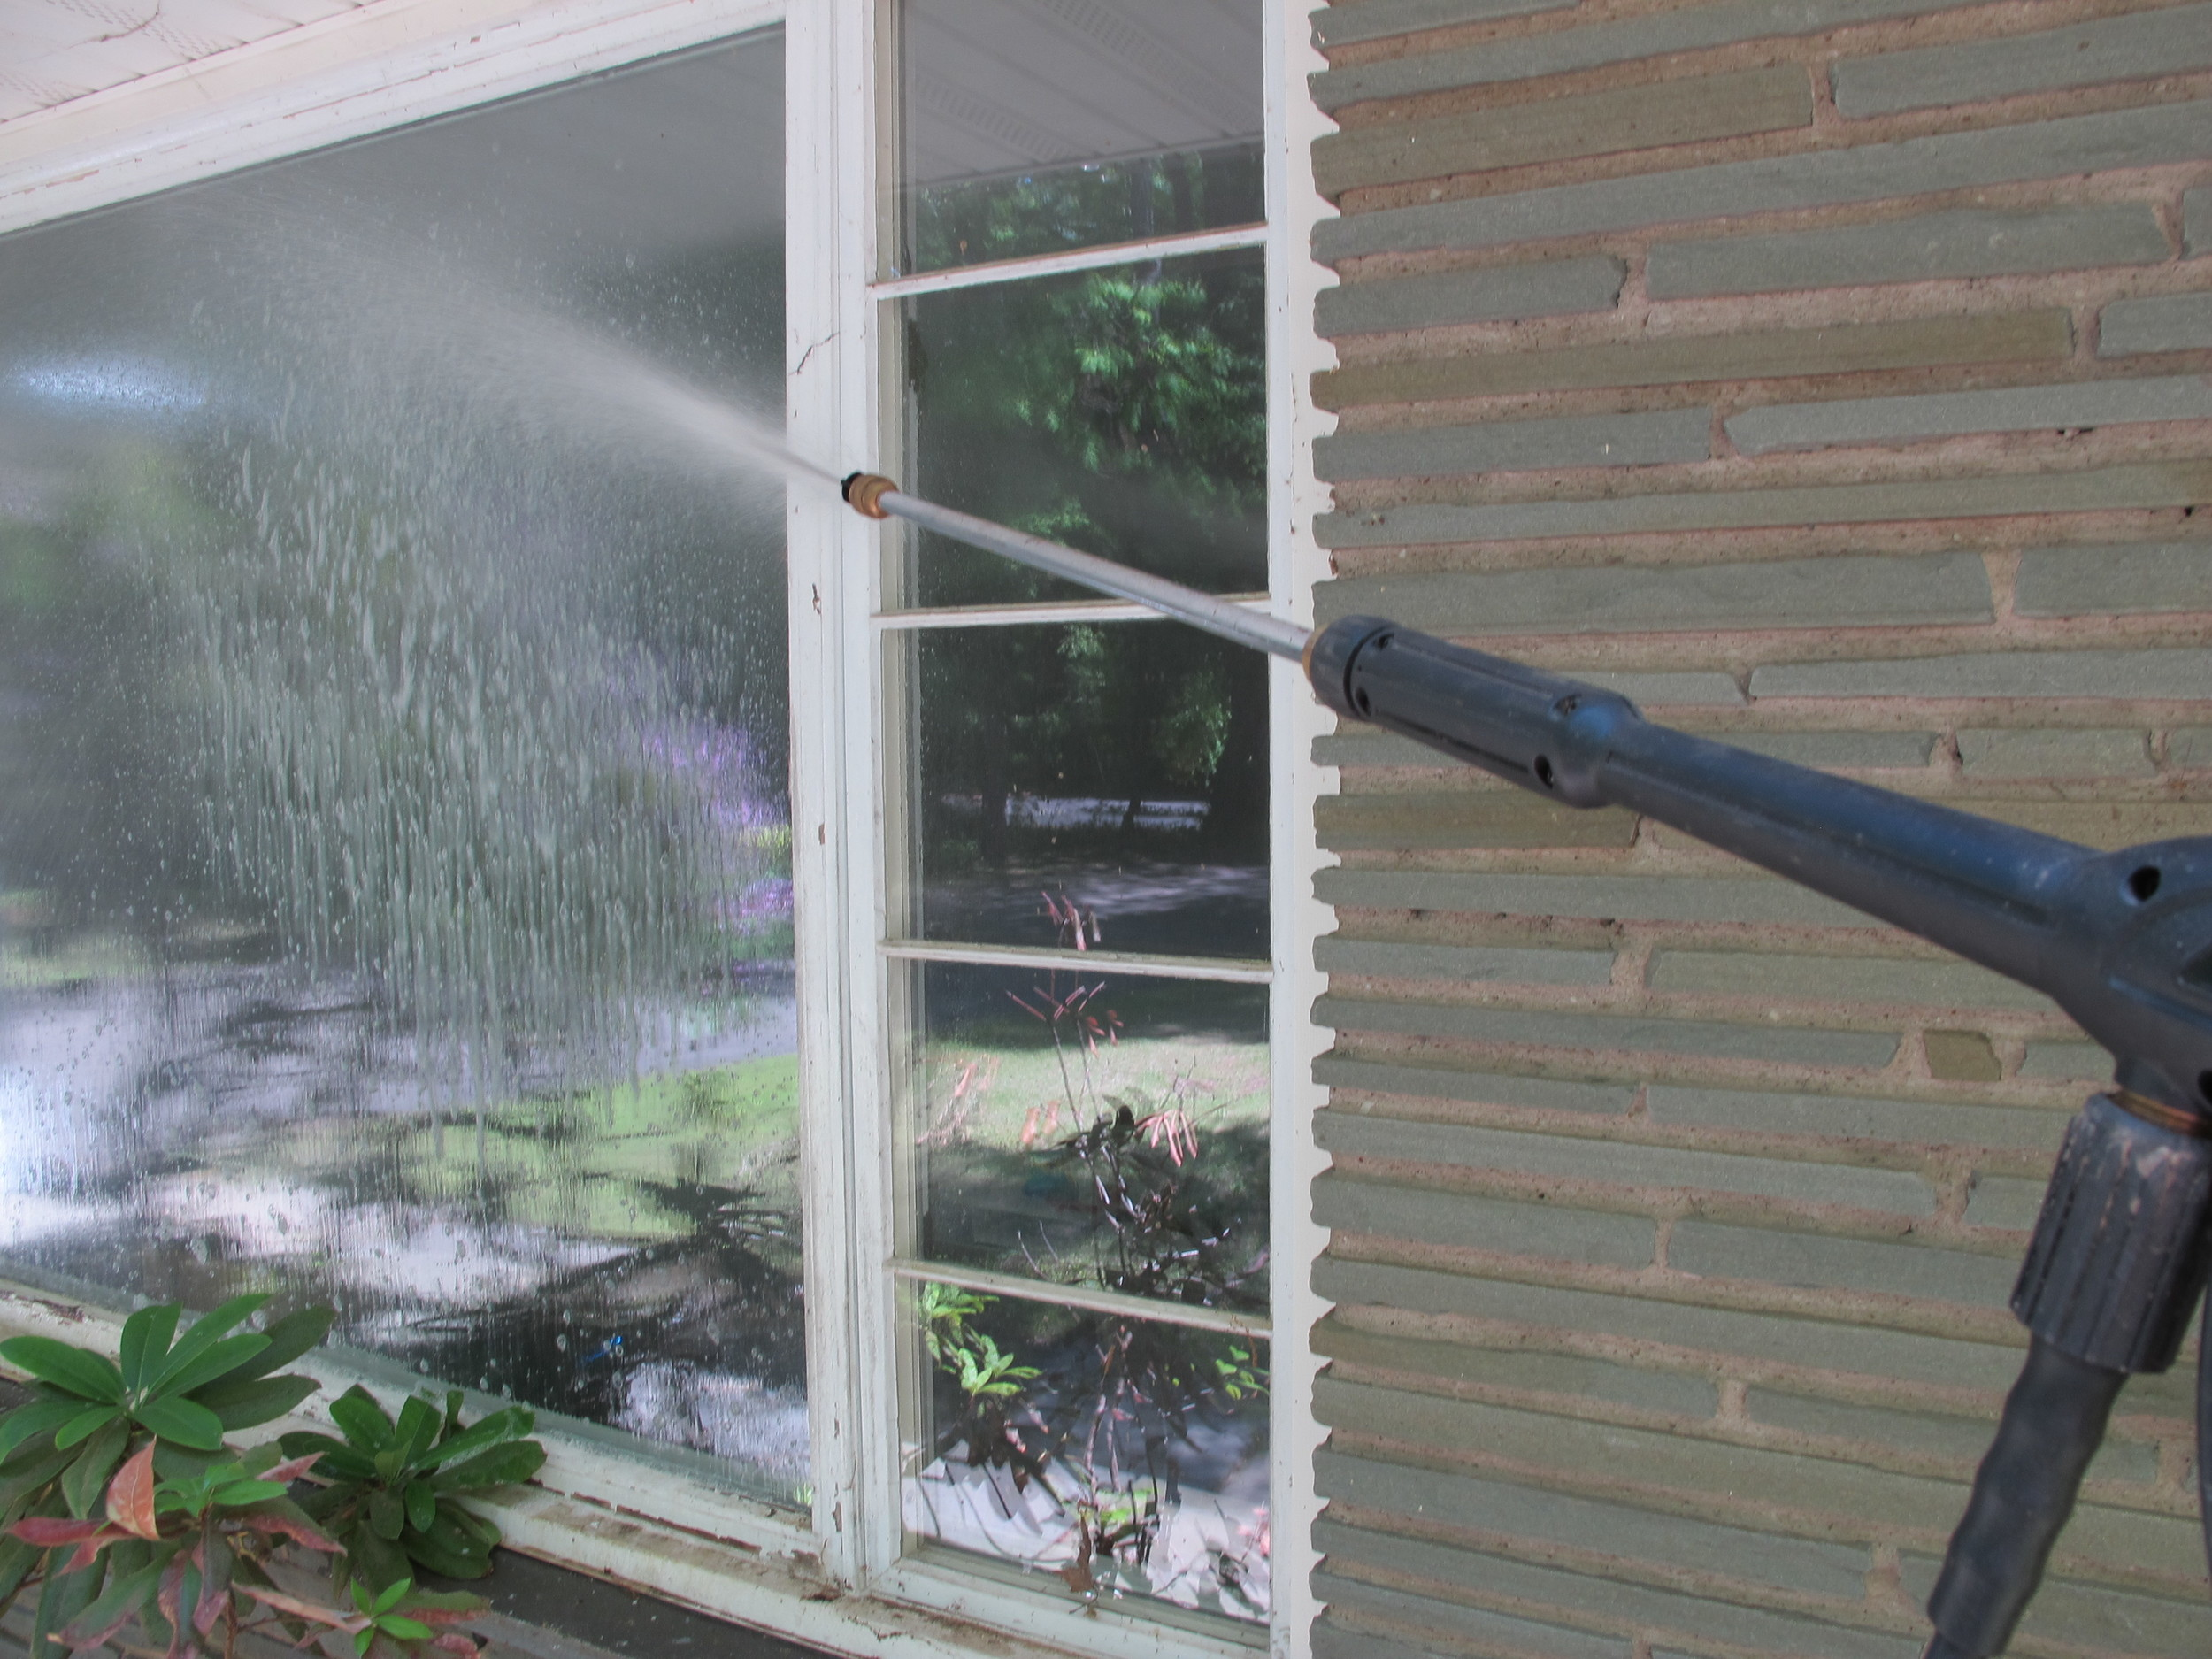 Orginal-Emily-Fazio_Clean-Windows-Pressure-Washer-spraying-soap.JPG